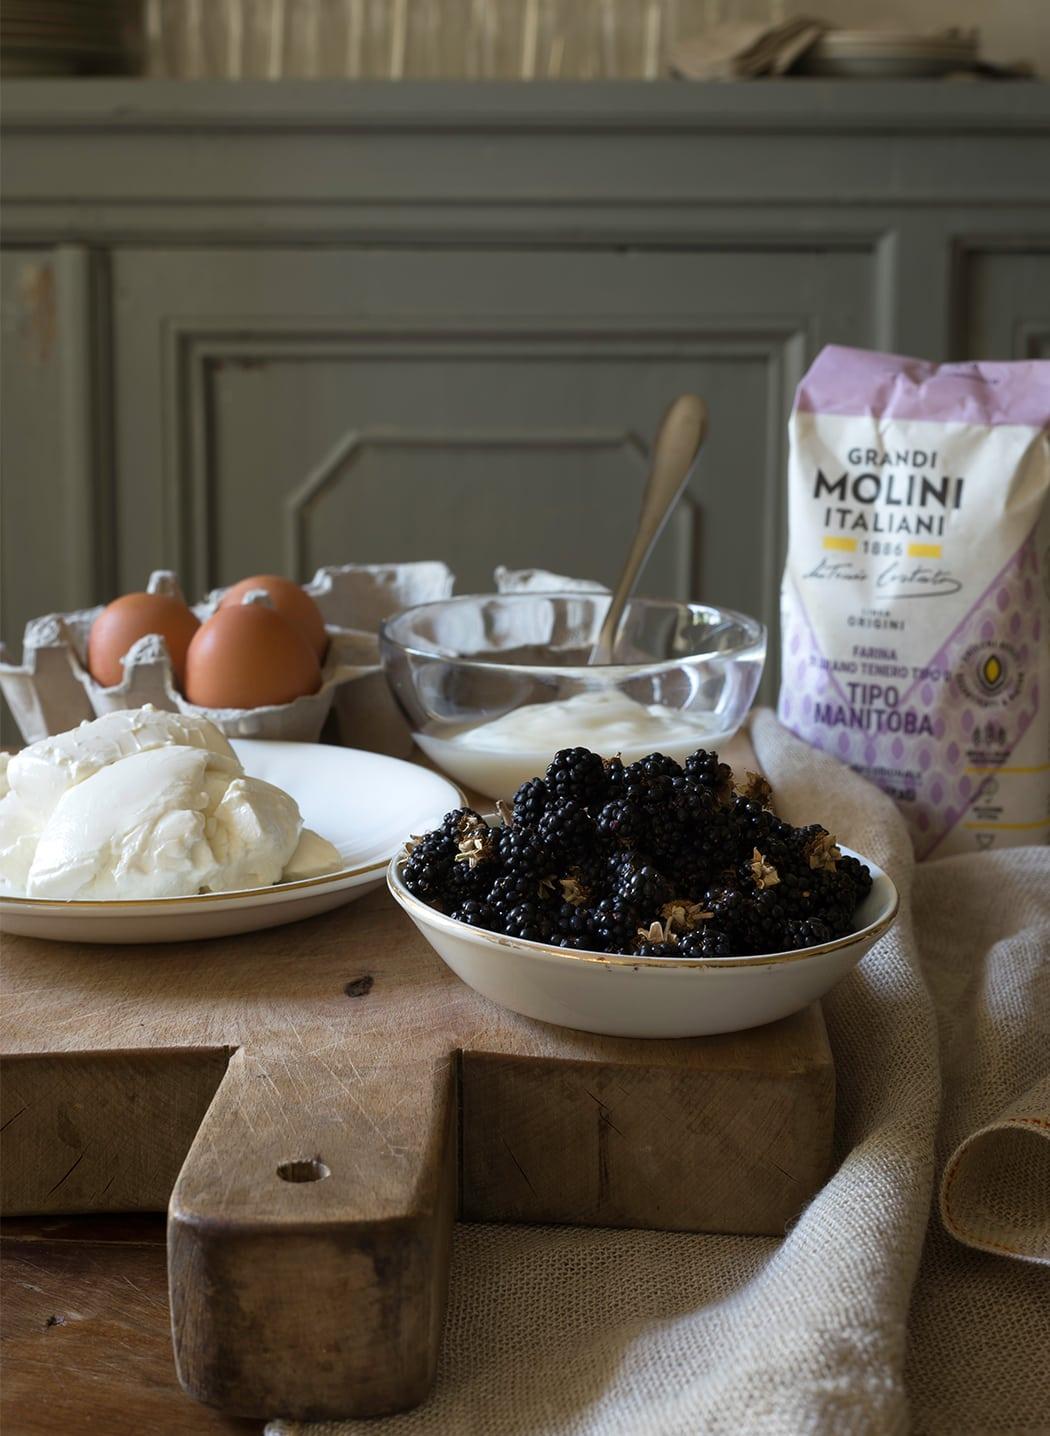 ingredienti per plumcake alle more